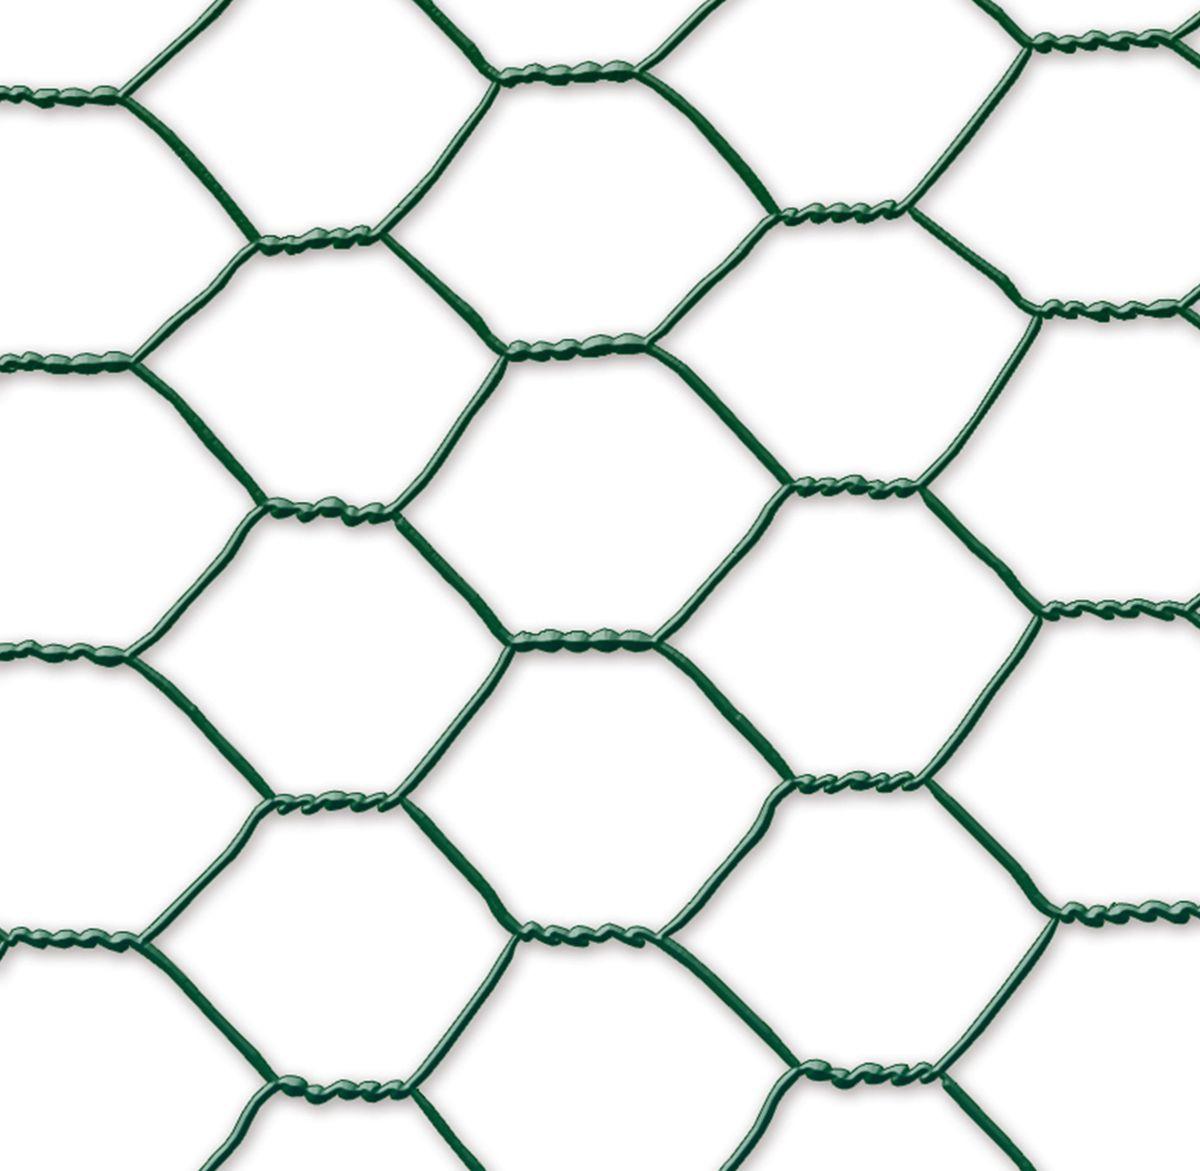 Grillage métal plastifié - 0,50 x 10 m/13 x 0,7 mm \